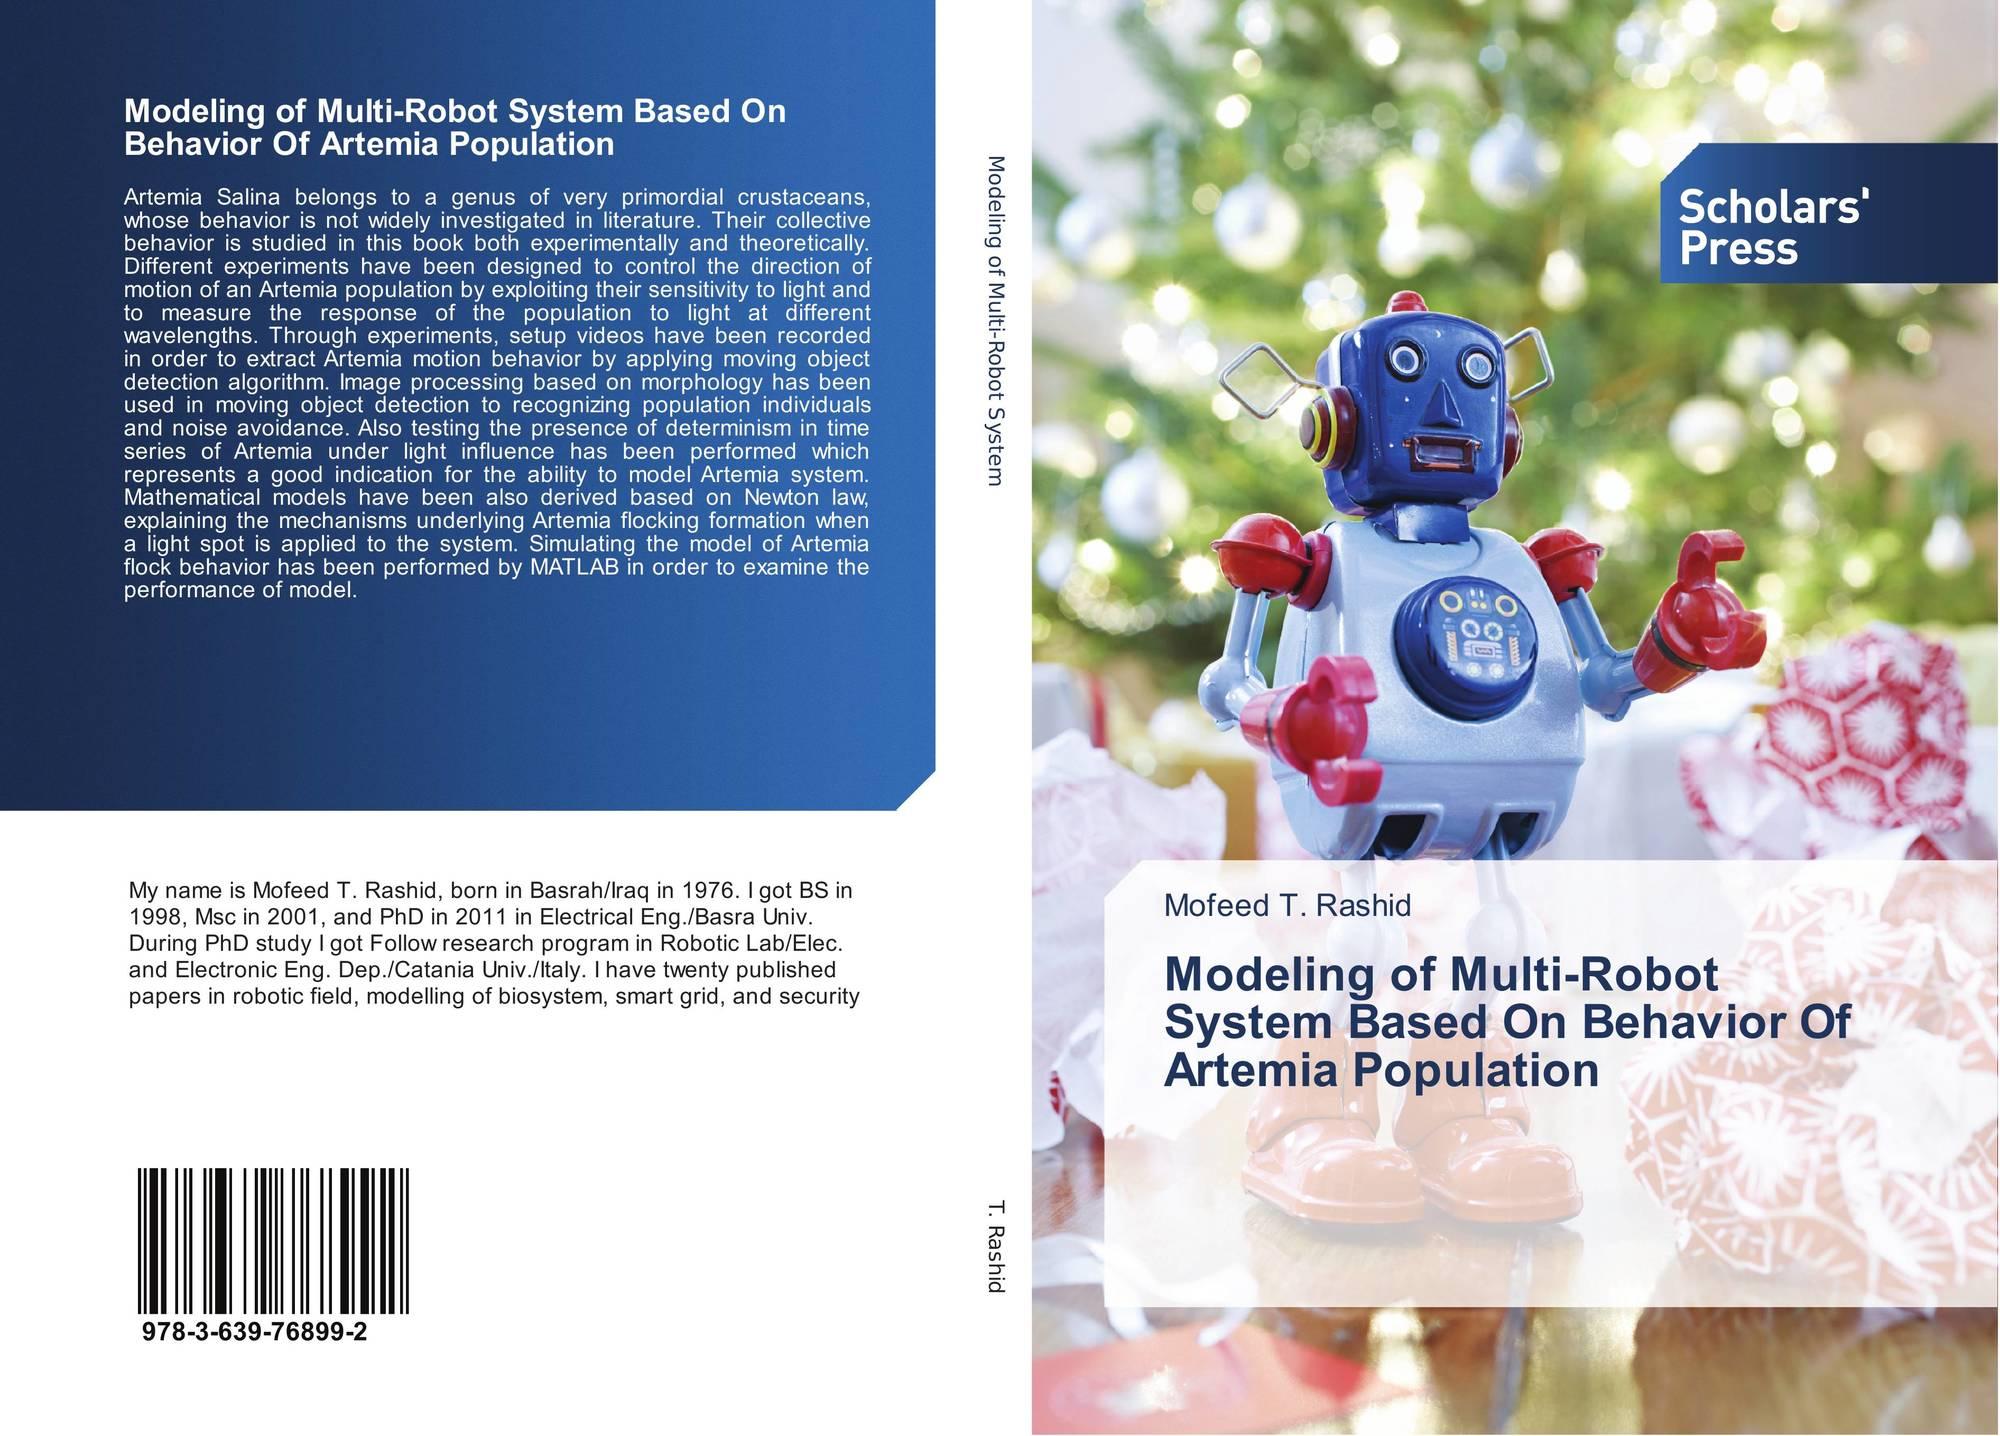 Modeling of Multi-Robot System Based On Behavior Of Artemia